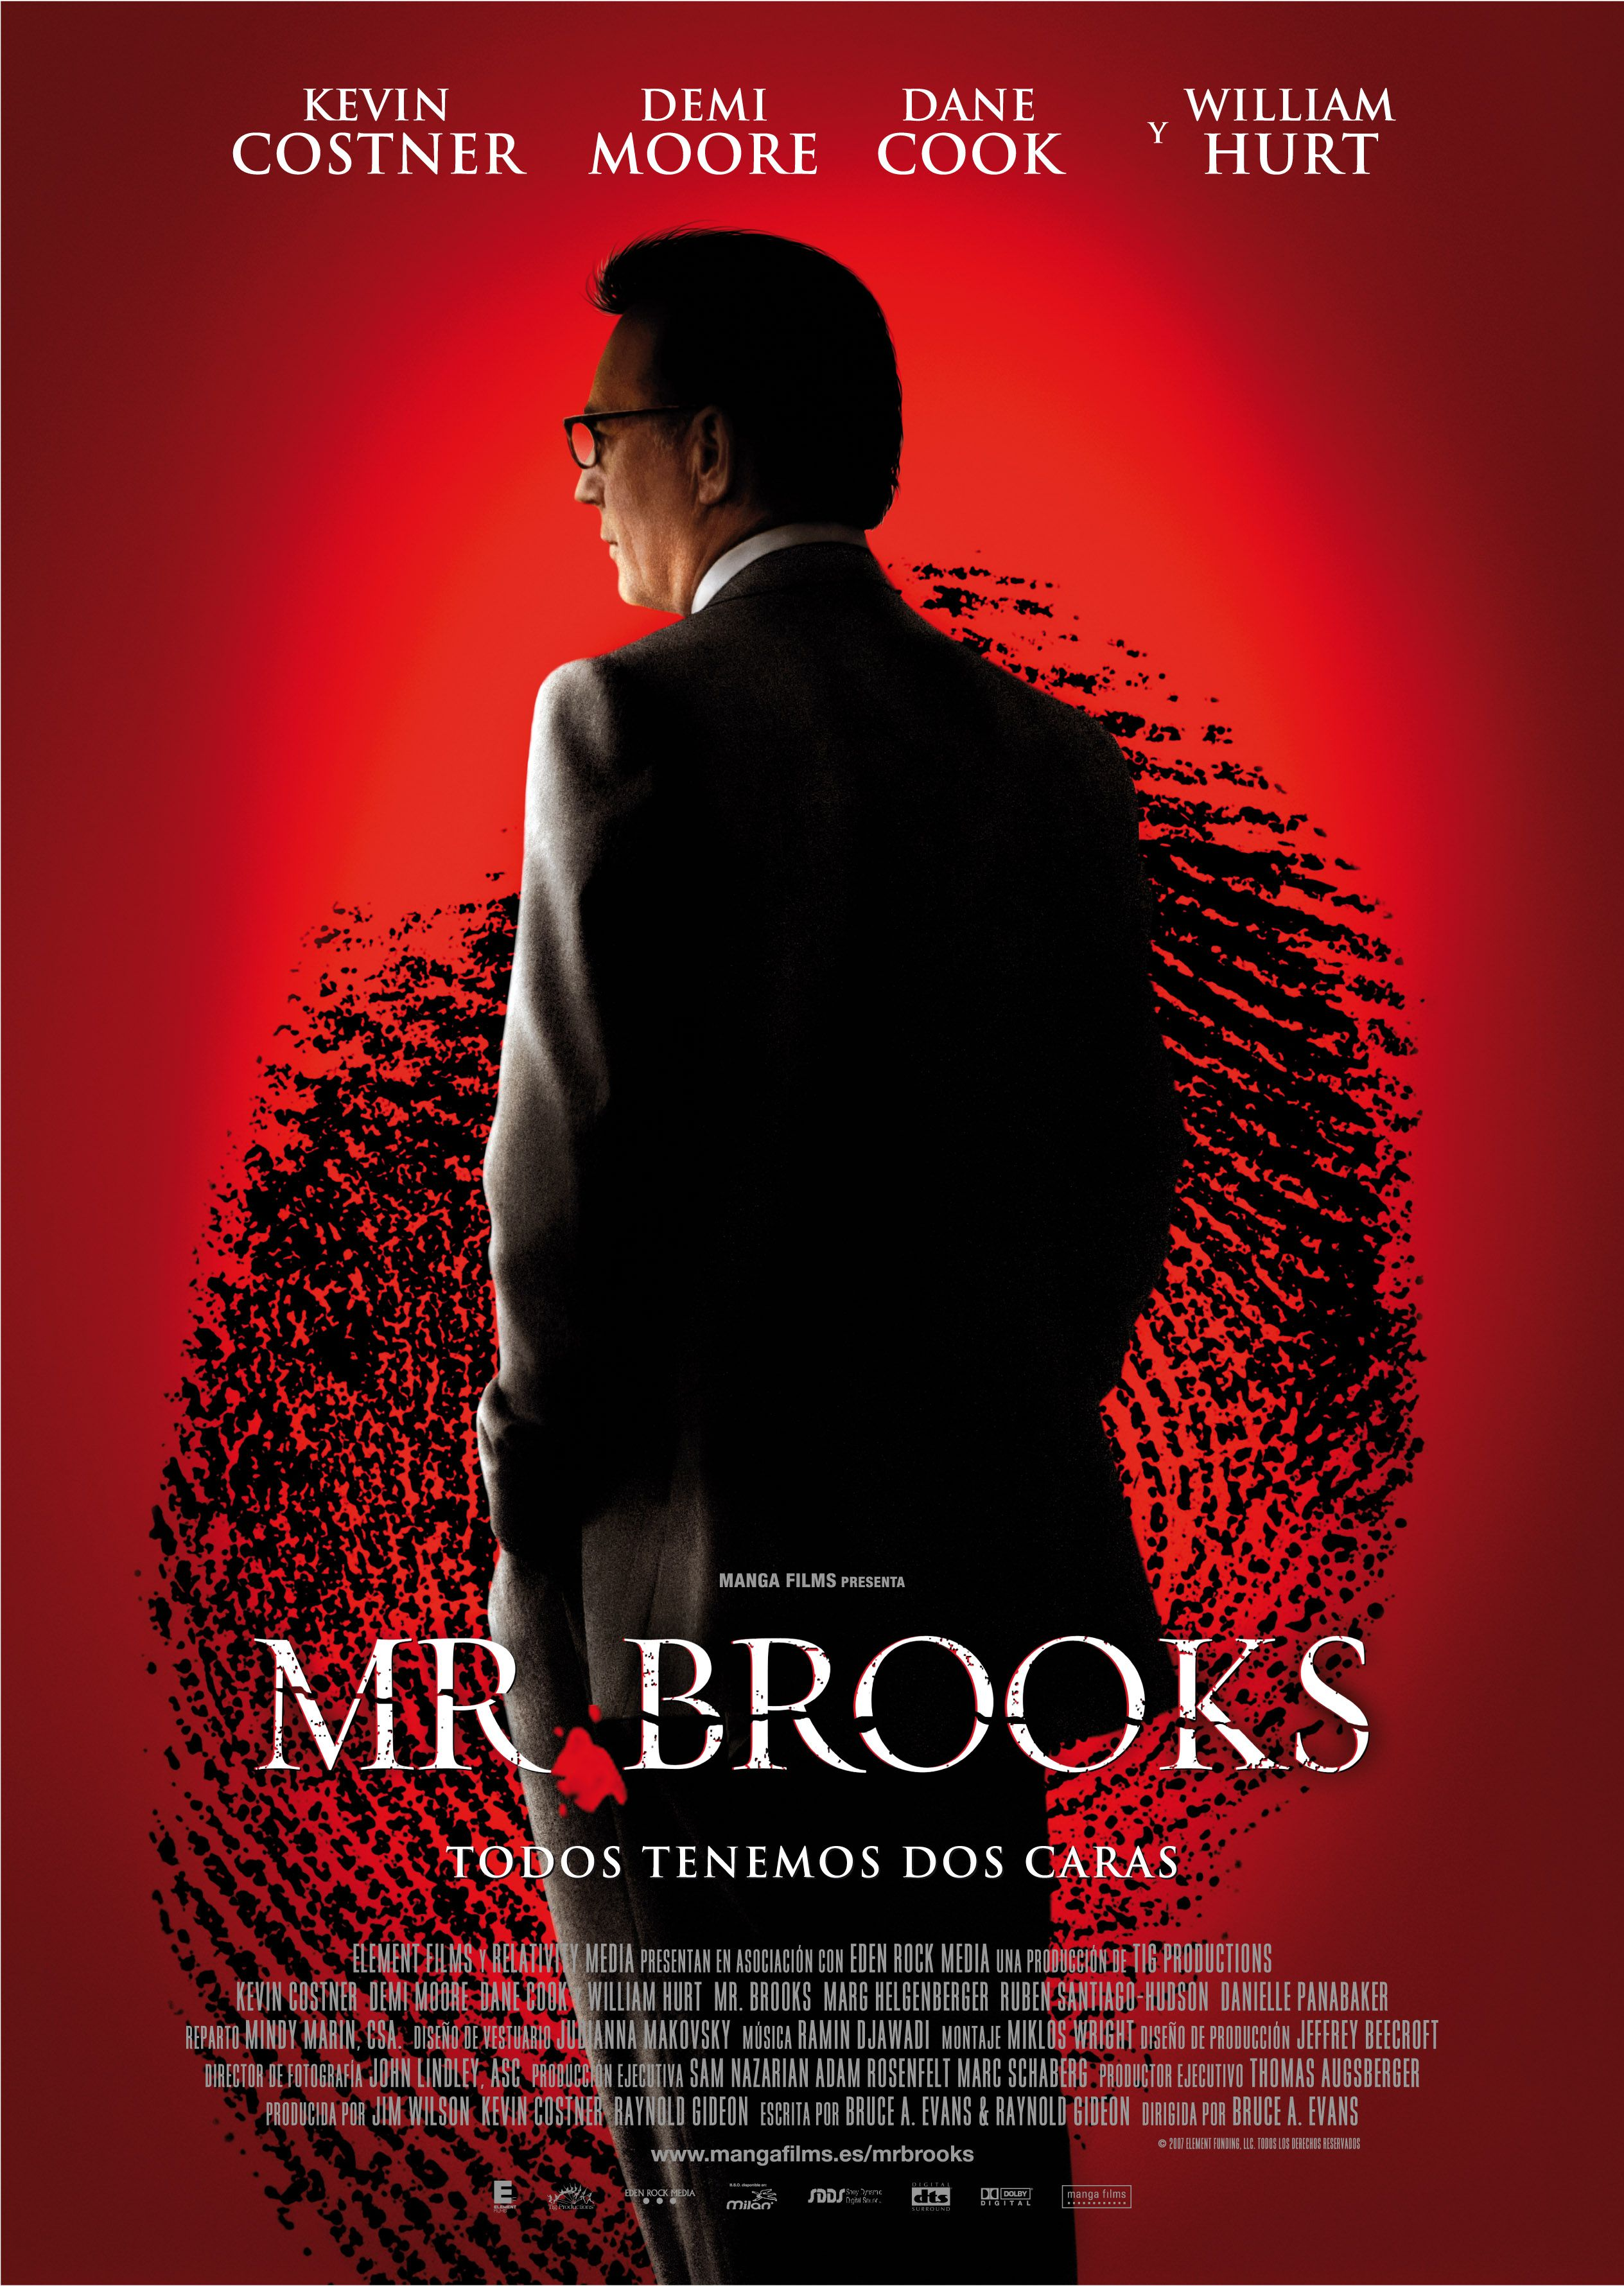 Sábias palabras del psicópata Señor Brooks